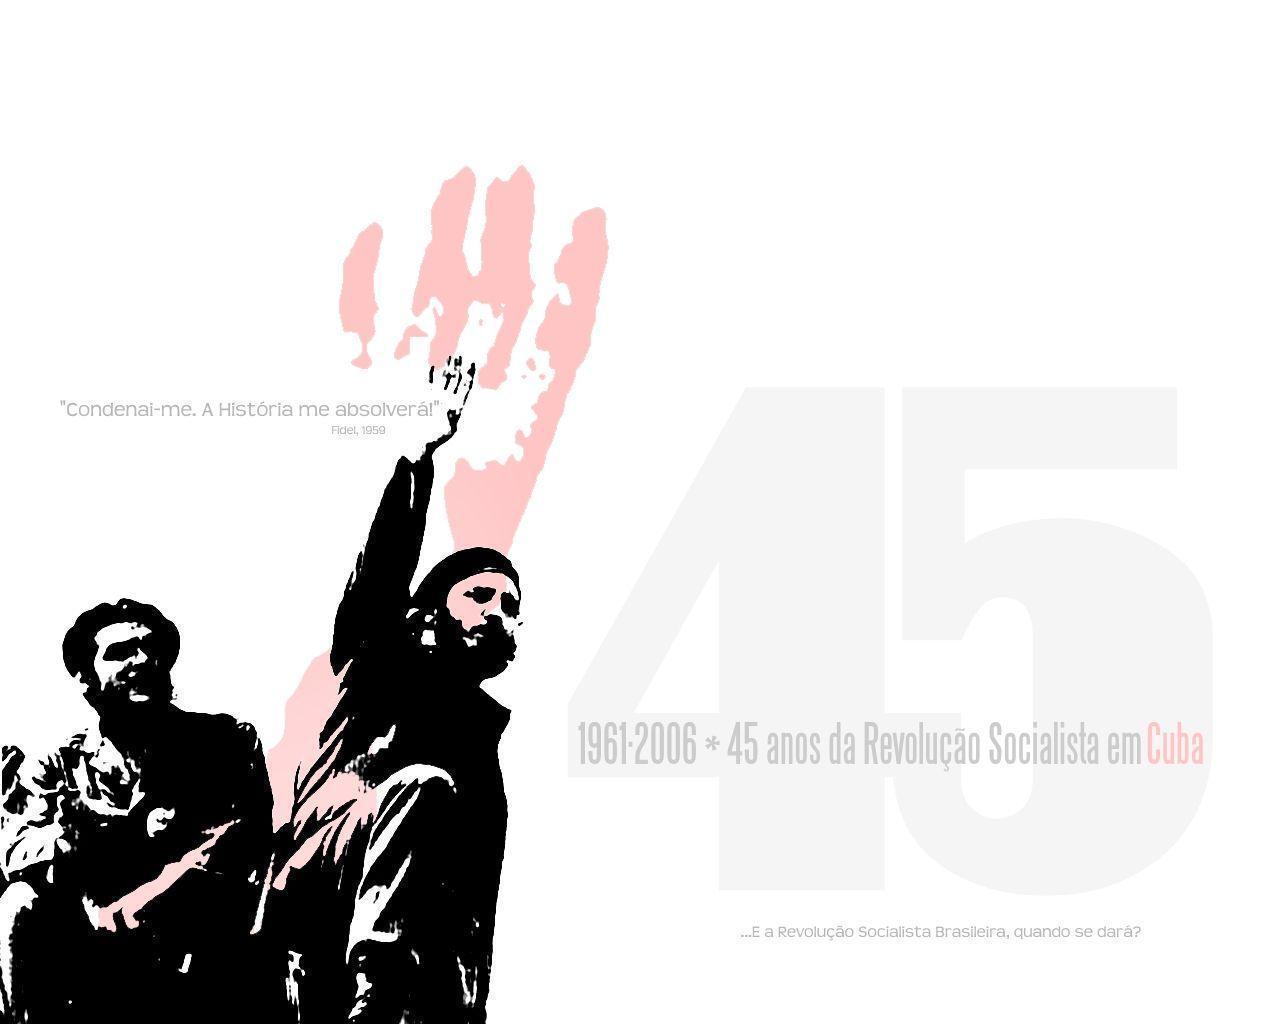 Socialist Wallpapers 1280x1024